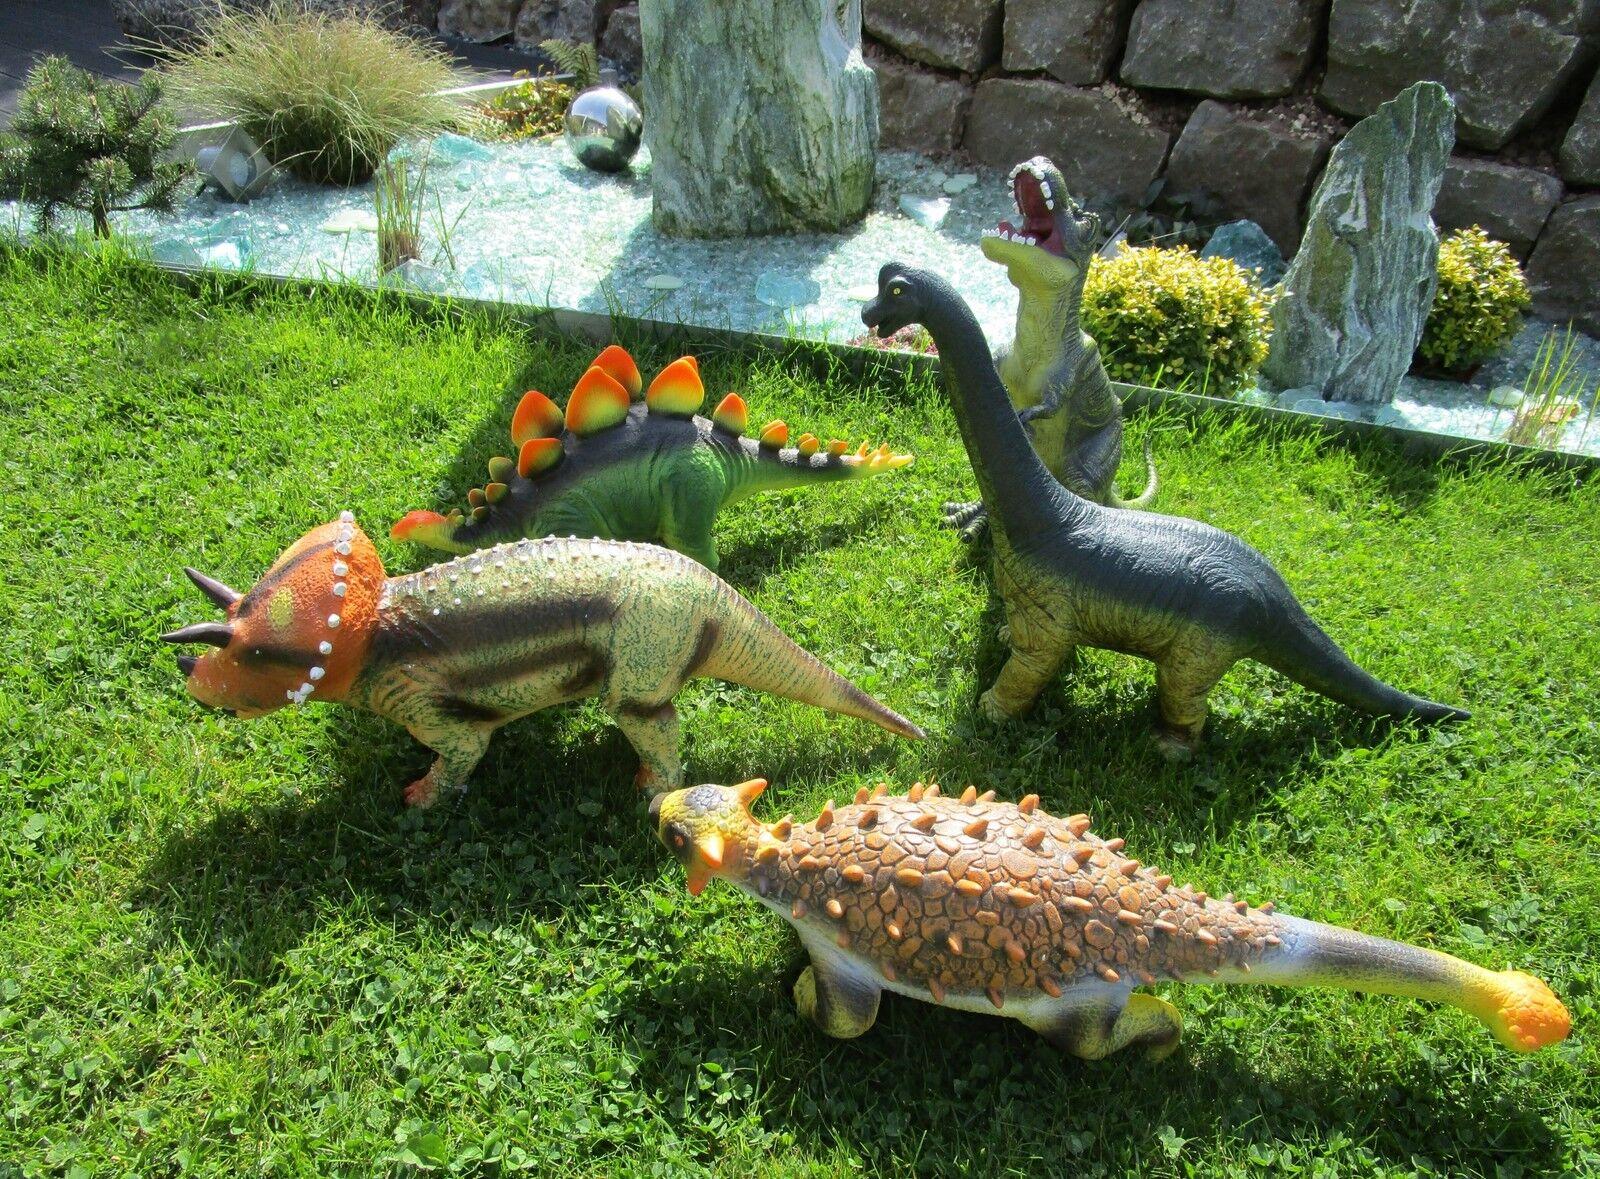 XXL dinosauri 5er Set Dinosauri personaggio TYRANNOSAURUS REX knautsch animali Top 30180